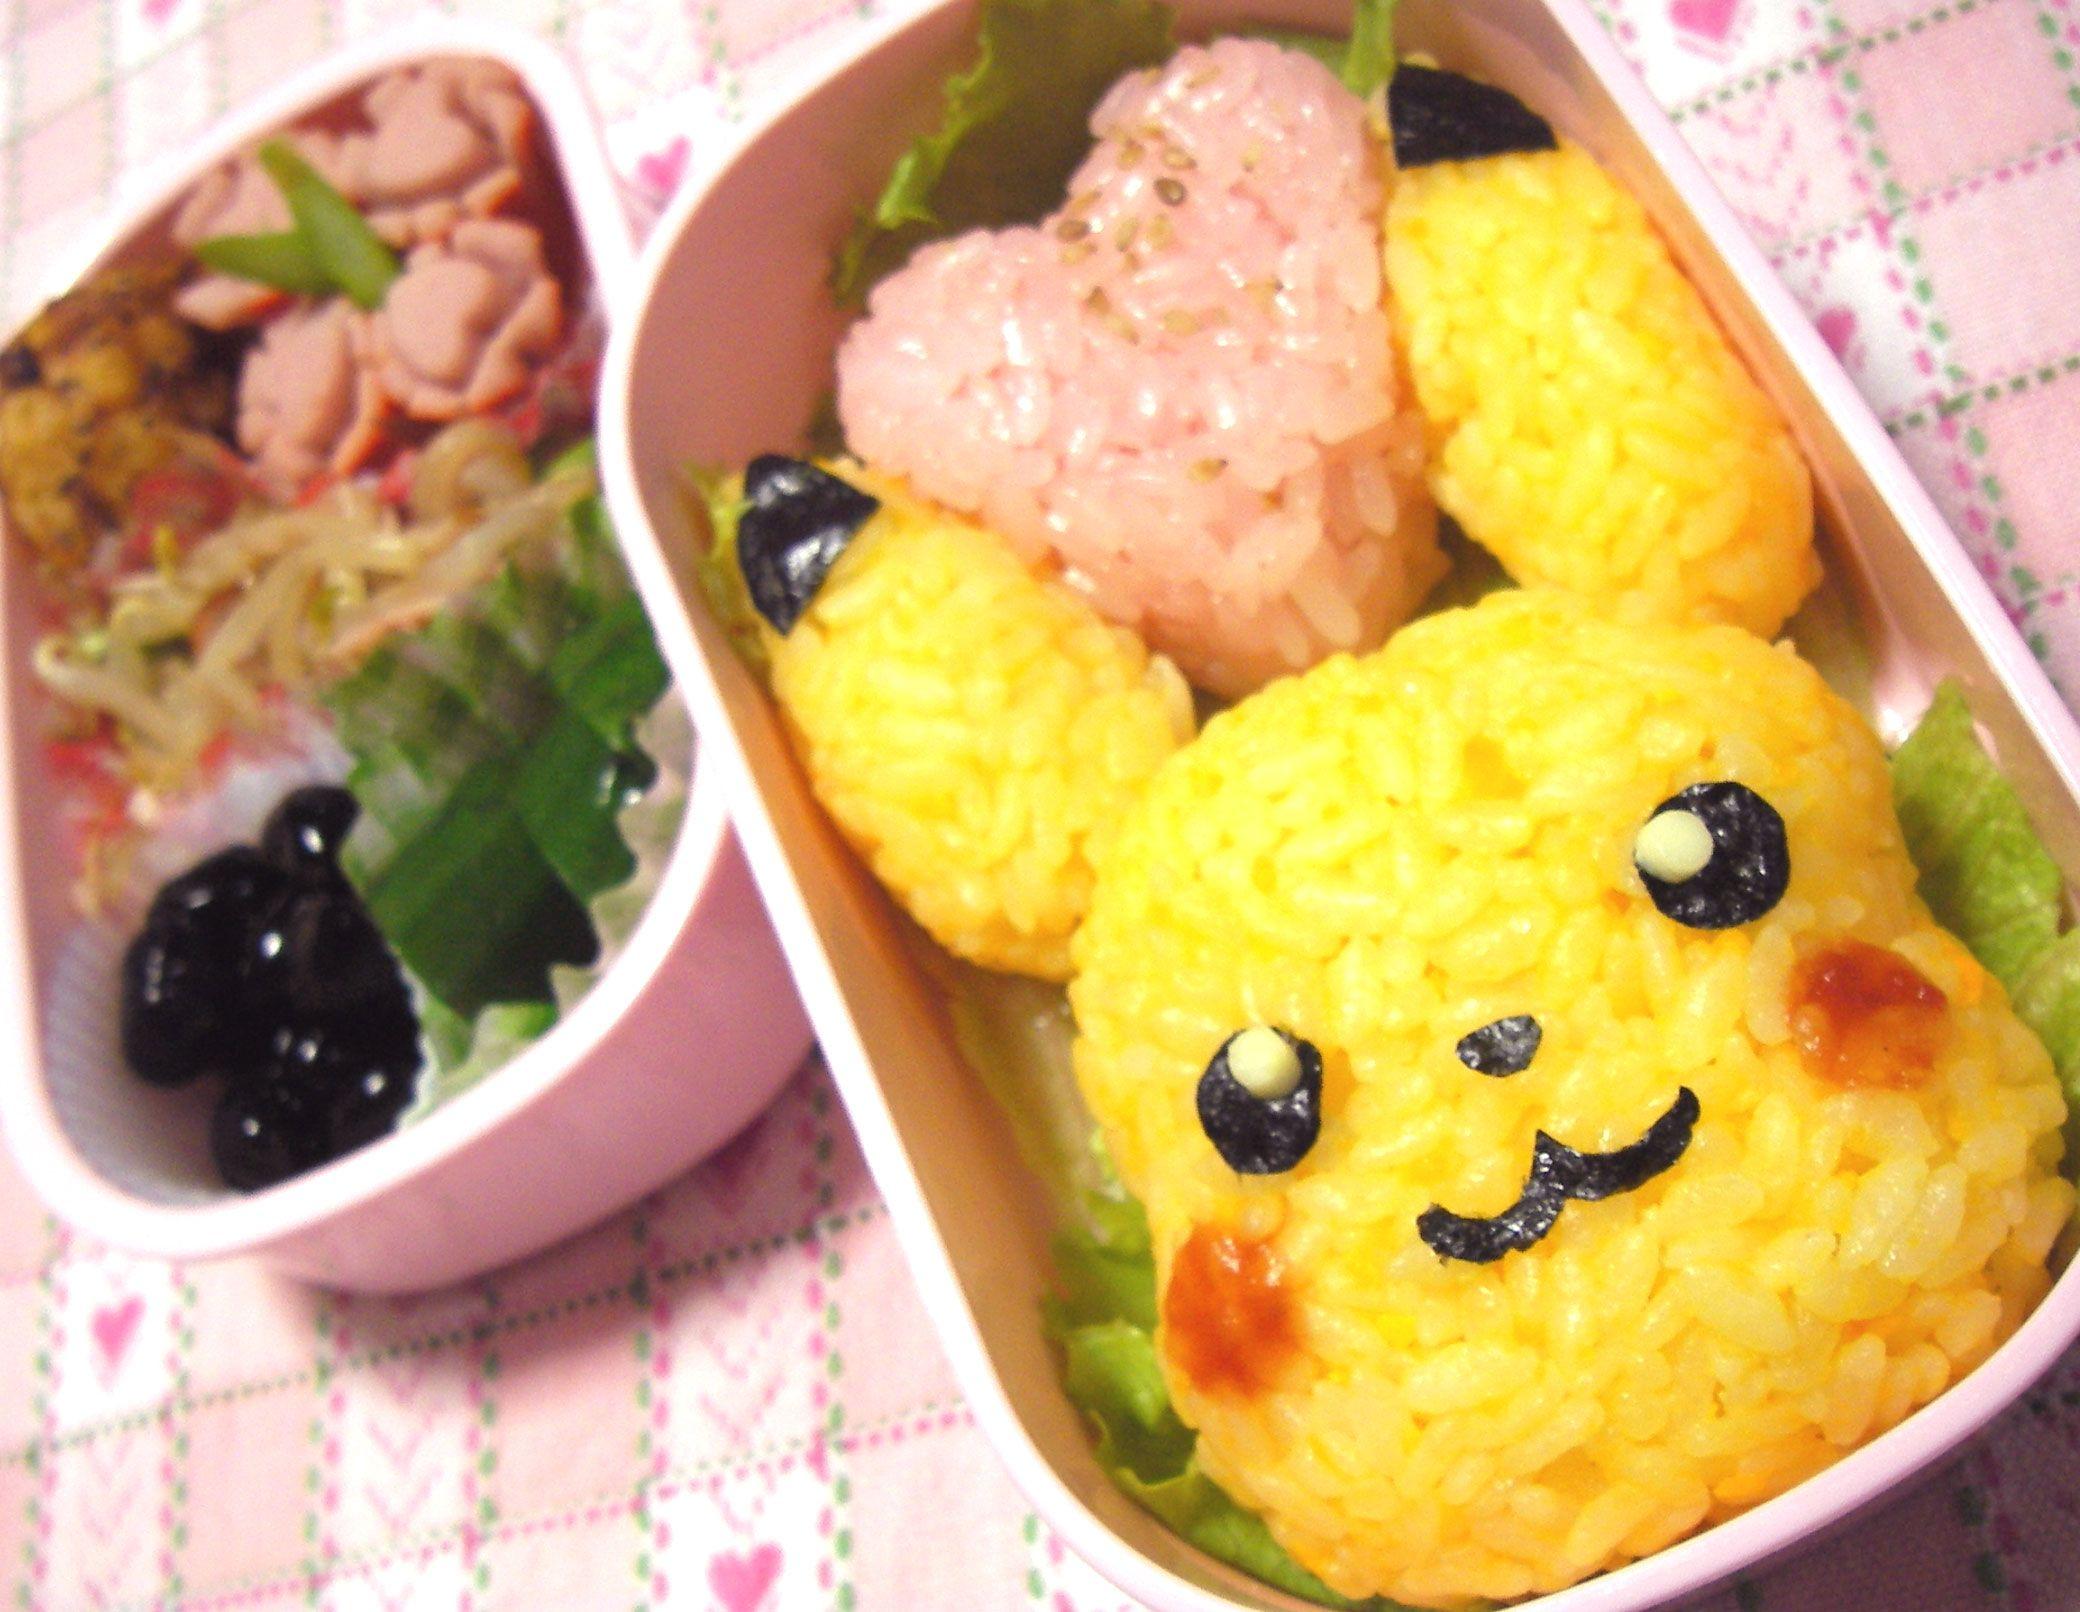 pikachu rice ball bento box recipe bento love pinterest bento bento box and rice ball. Black Bedroom Furniture Sets. Home Design Ideas